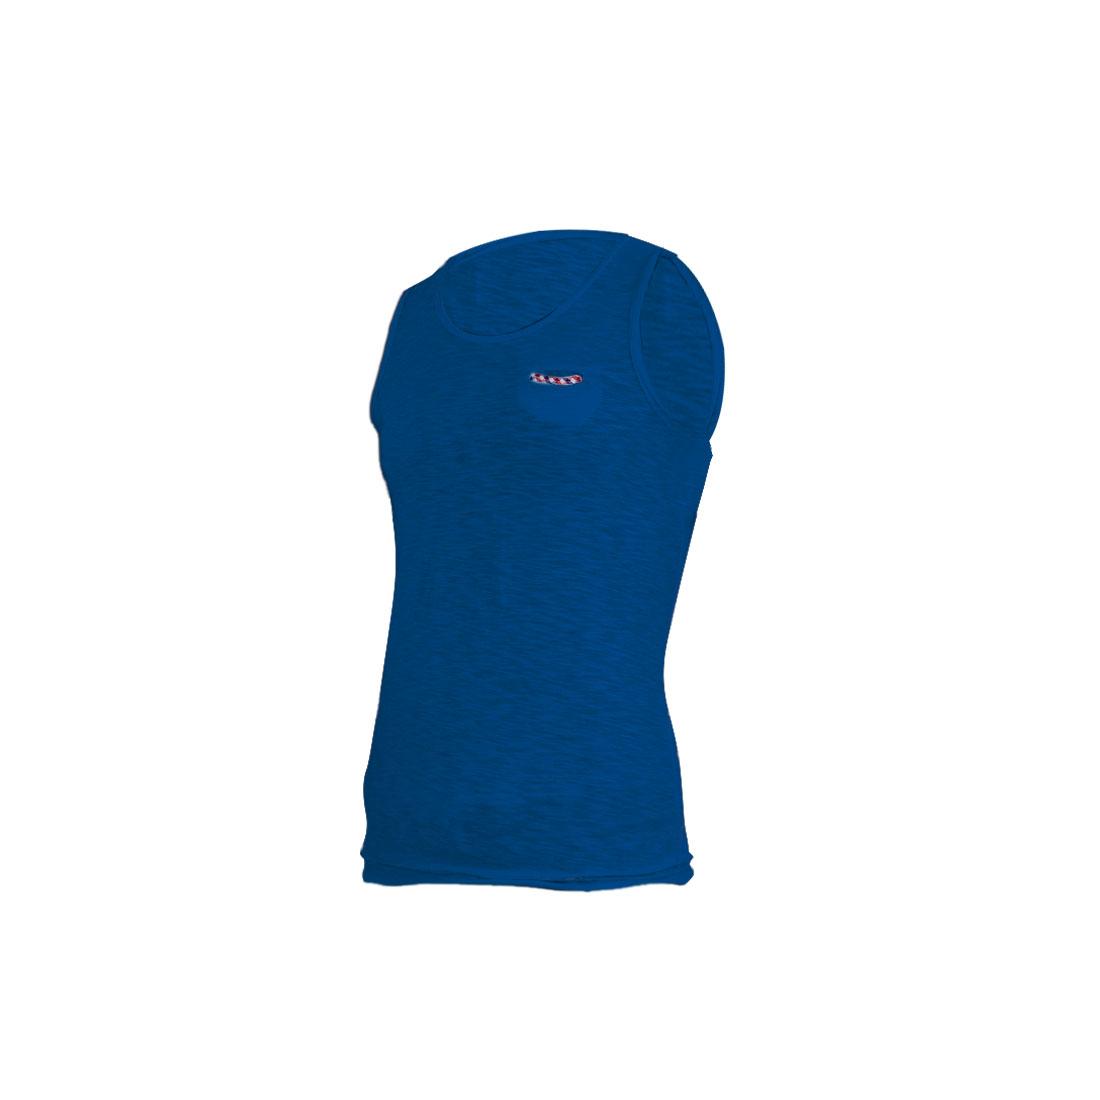 Men Chest Pocket Front Elastic Sleeveless Blue Tank Top S